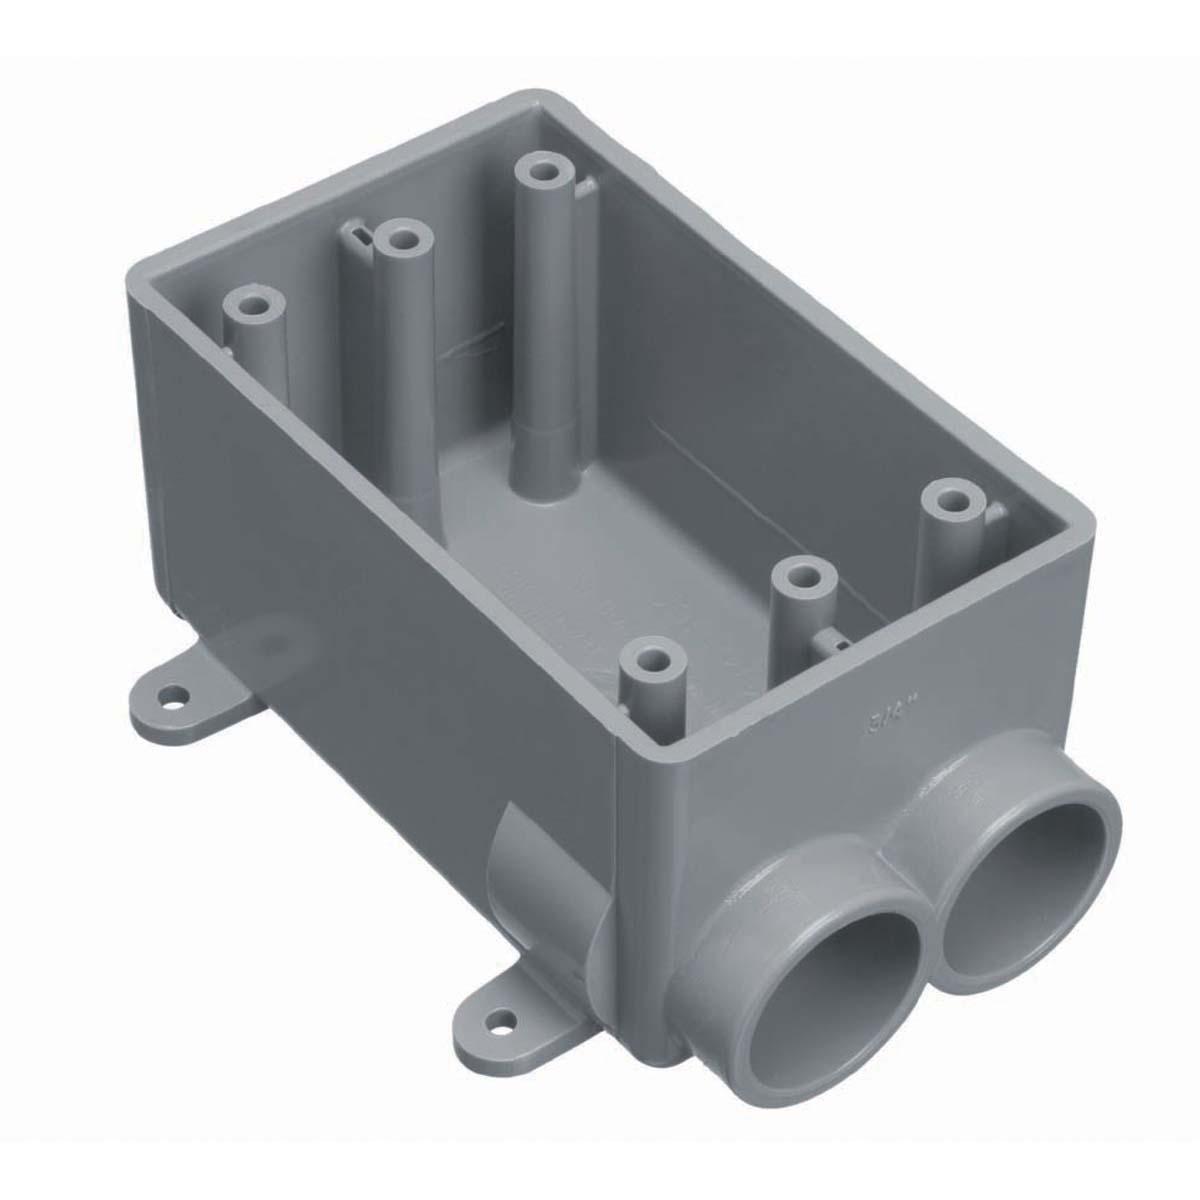 CARLON E982DFNL-4 SGL GANG FSC BOX18CU 1/2IN PVC 4PK